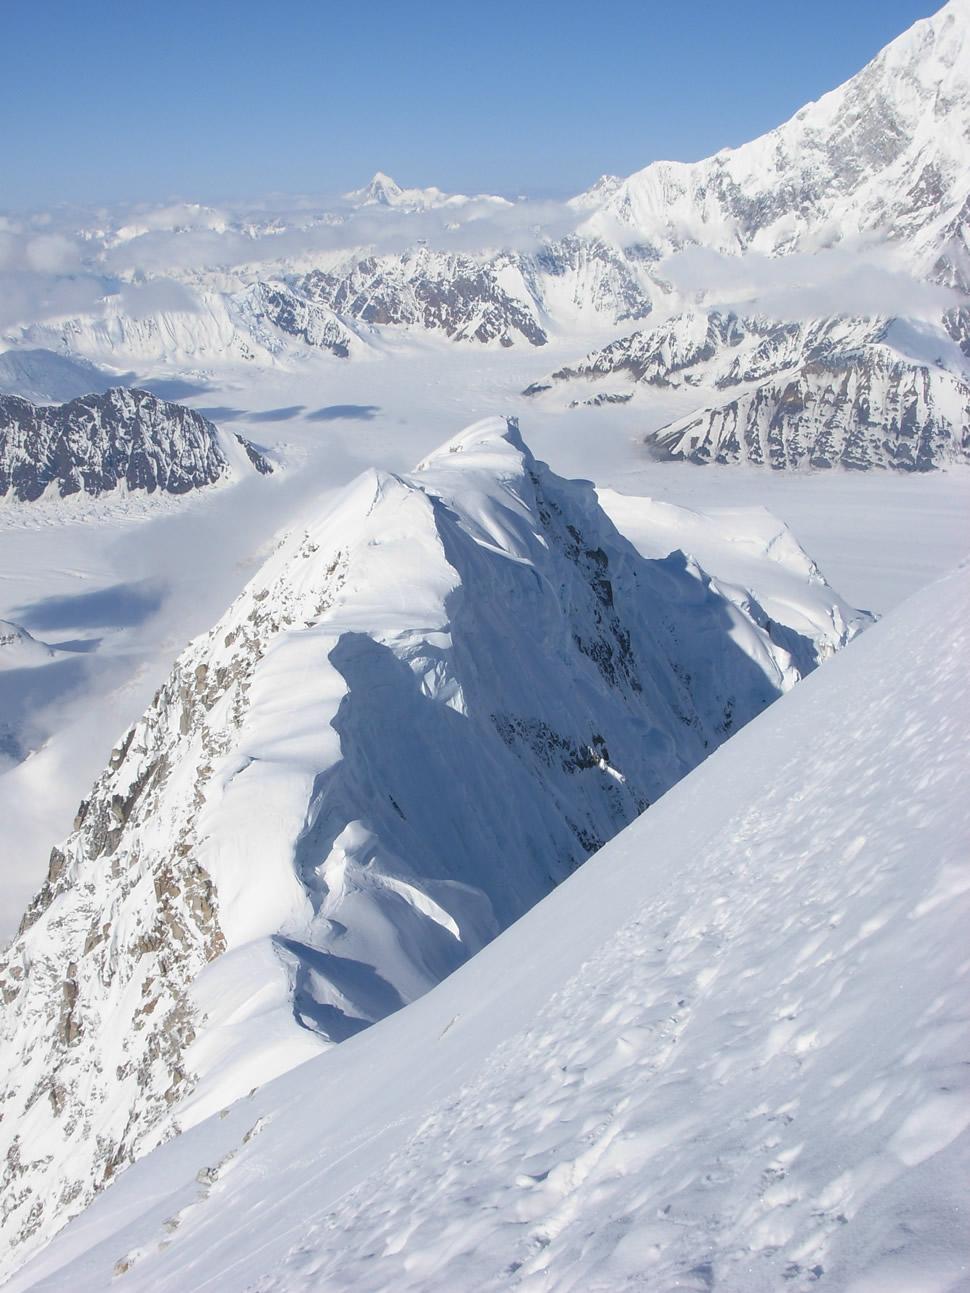 6aa17e414cb6 Alaska Expedition - Climbing Training - Tour Companies | Mountain Trip